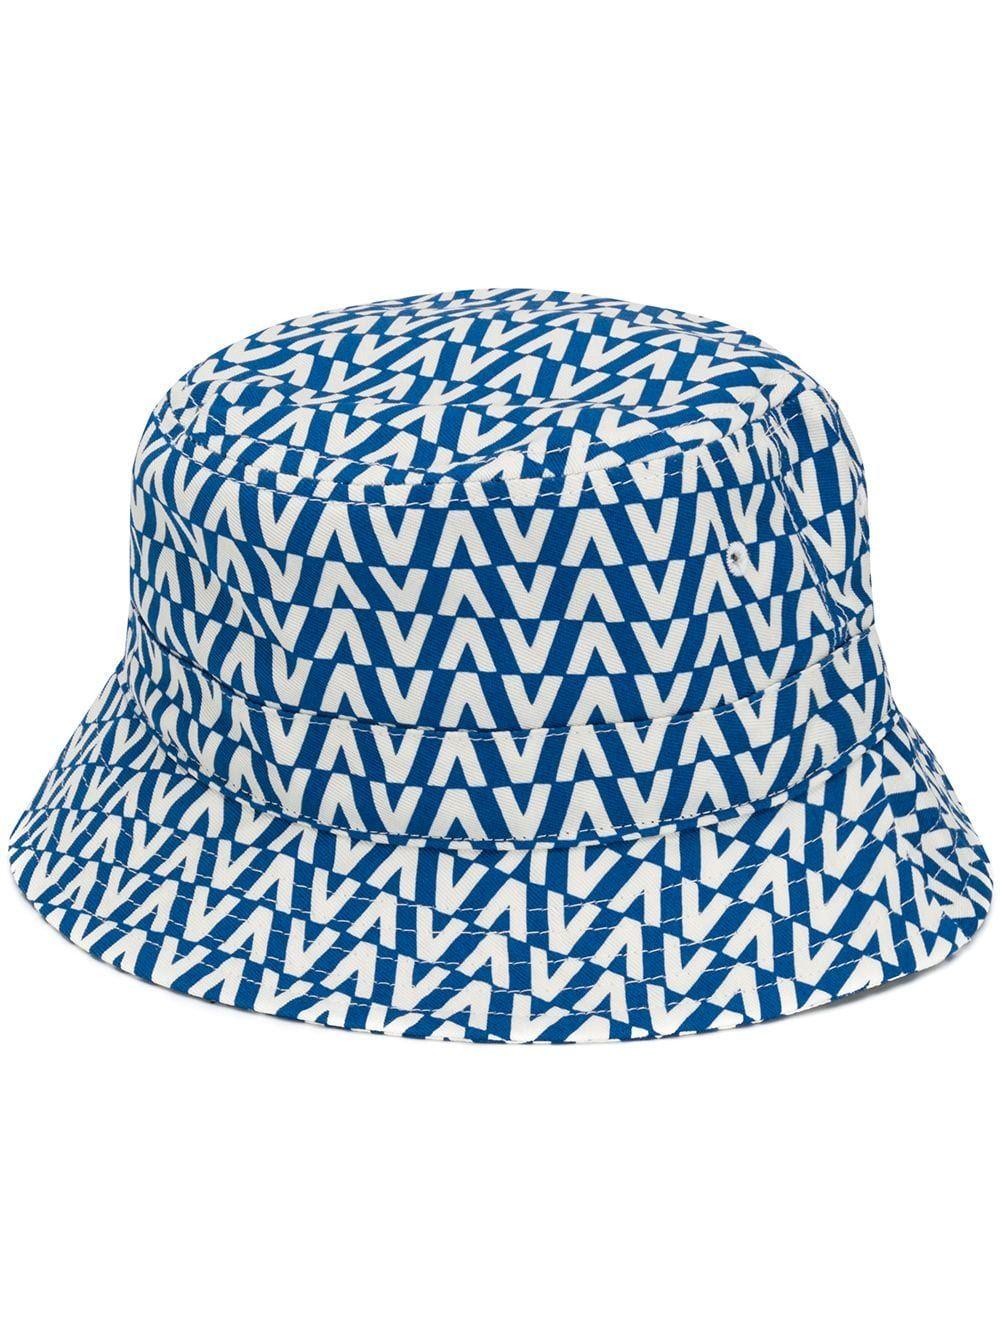 150564eb VALENTINO VALENTINO OPTICAL V BUCKET HAT - BLUE. #valentino ...